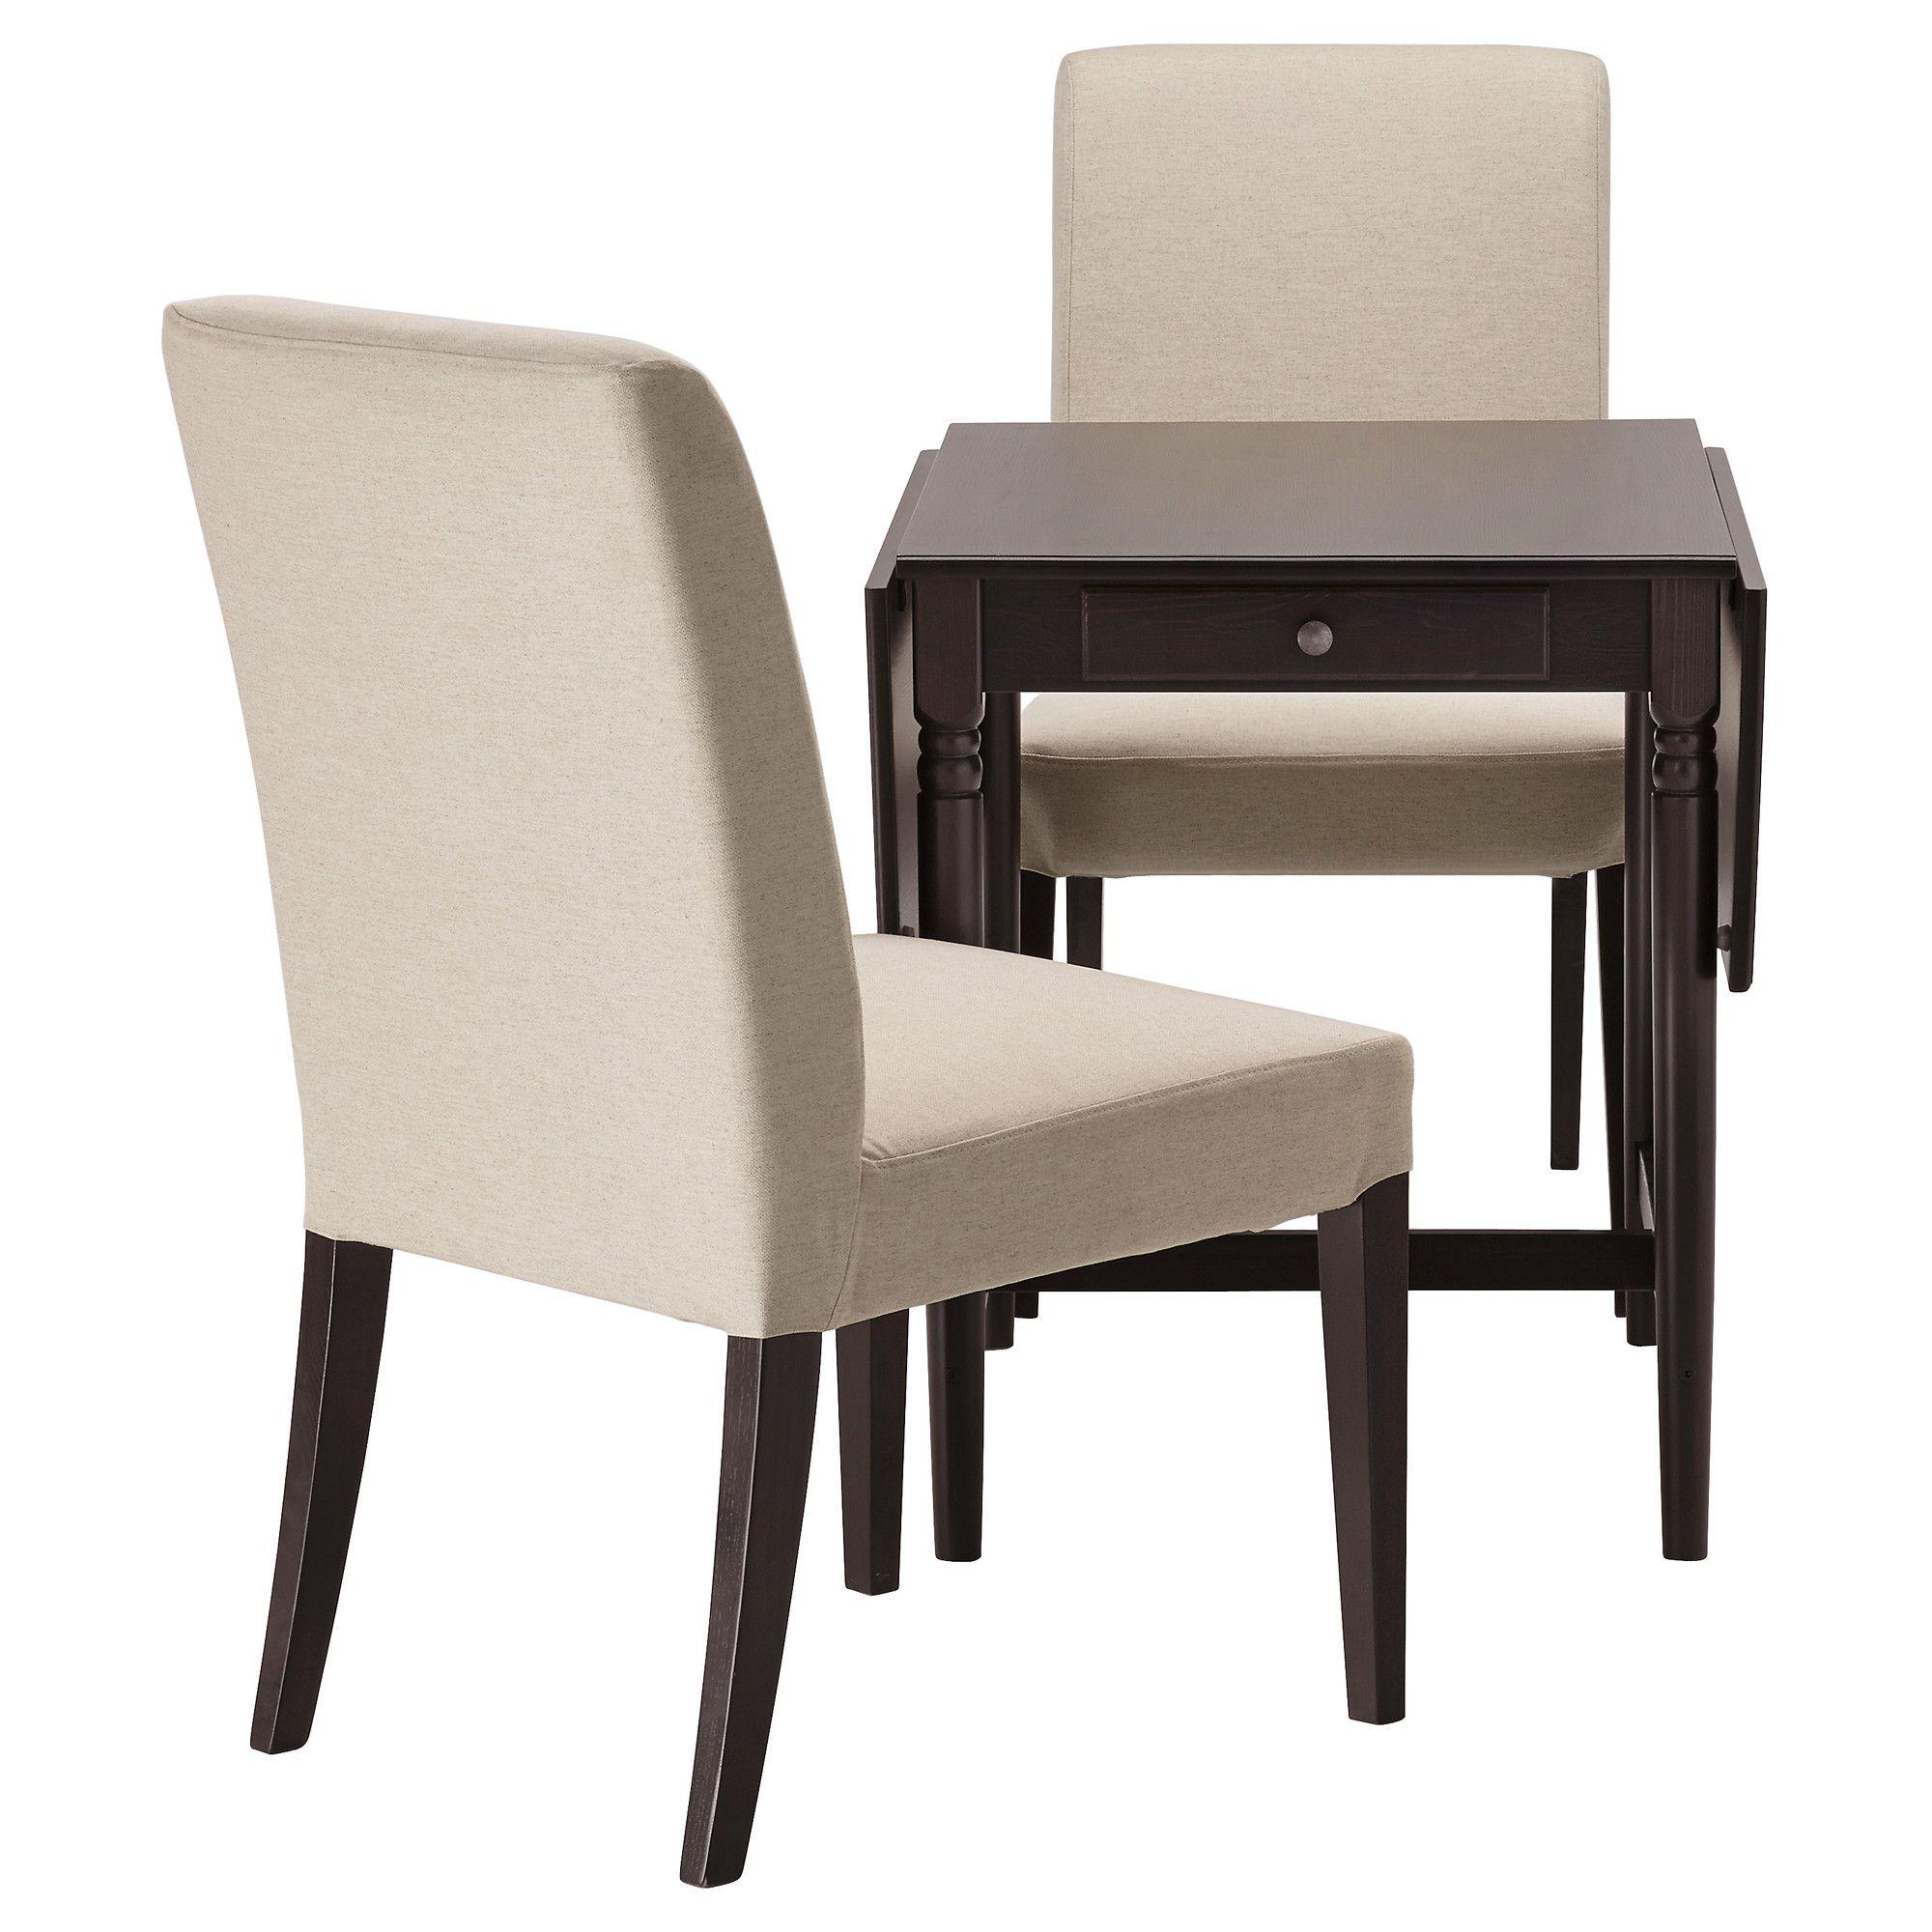 Folding Dining Room Chair Dining E841d446243f8c9447a246b5e27587c9 Dining Ikea Foldable